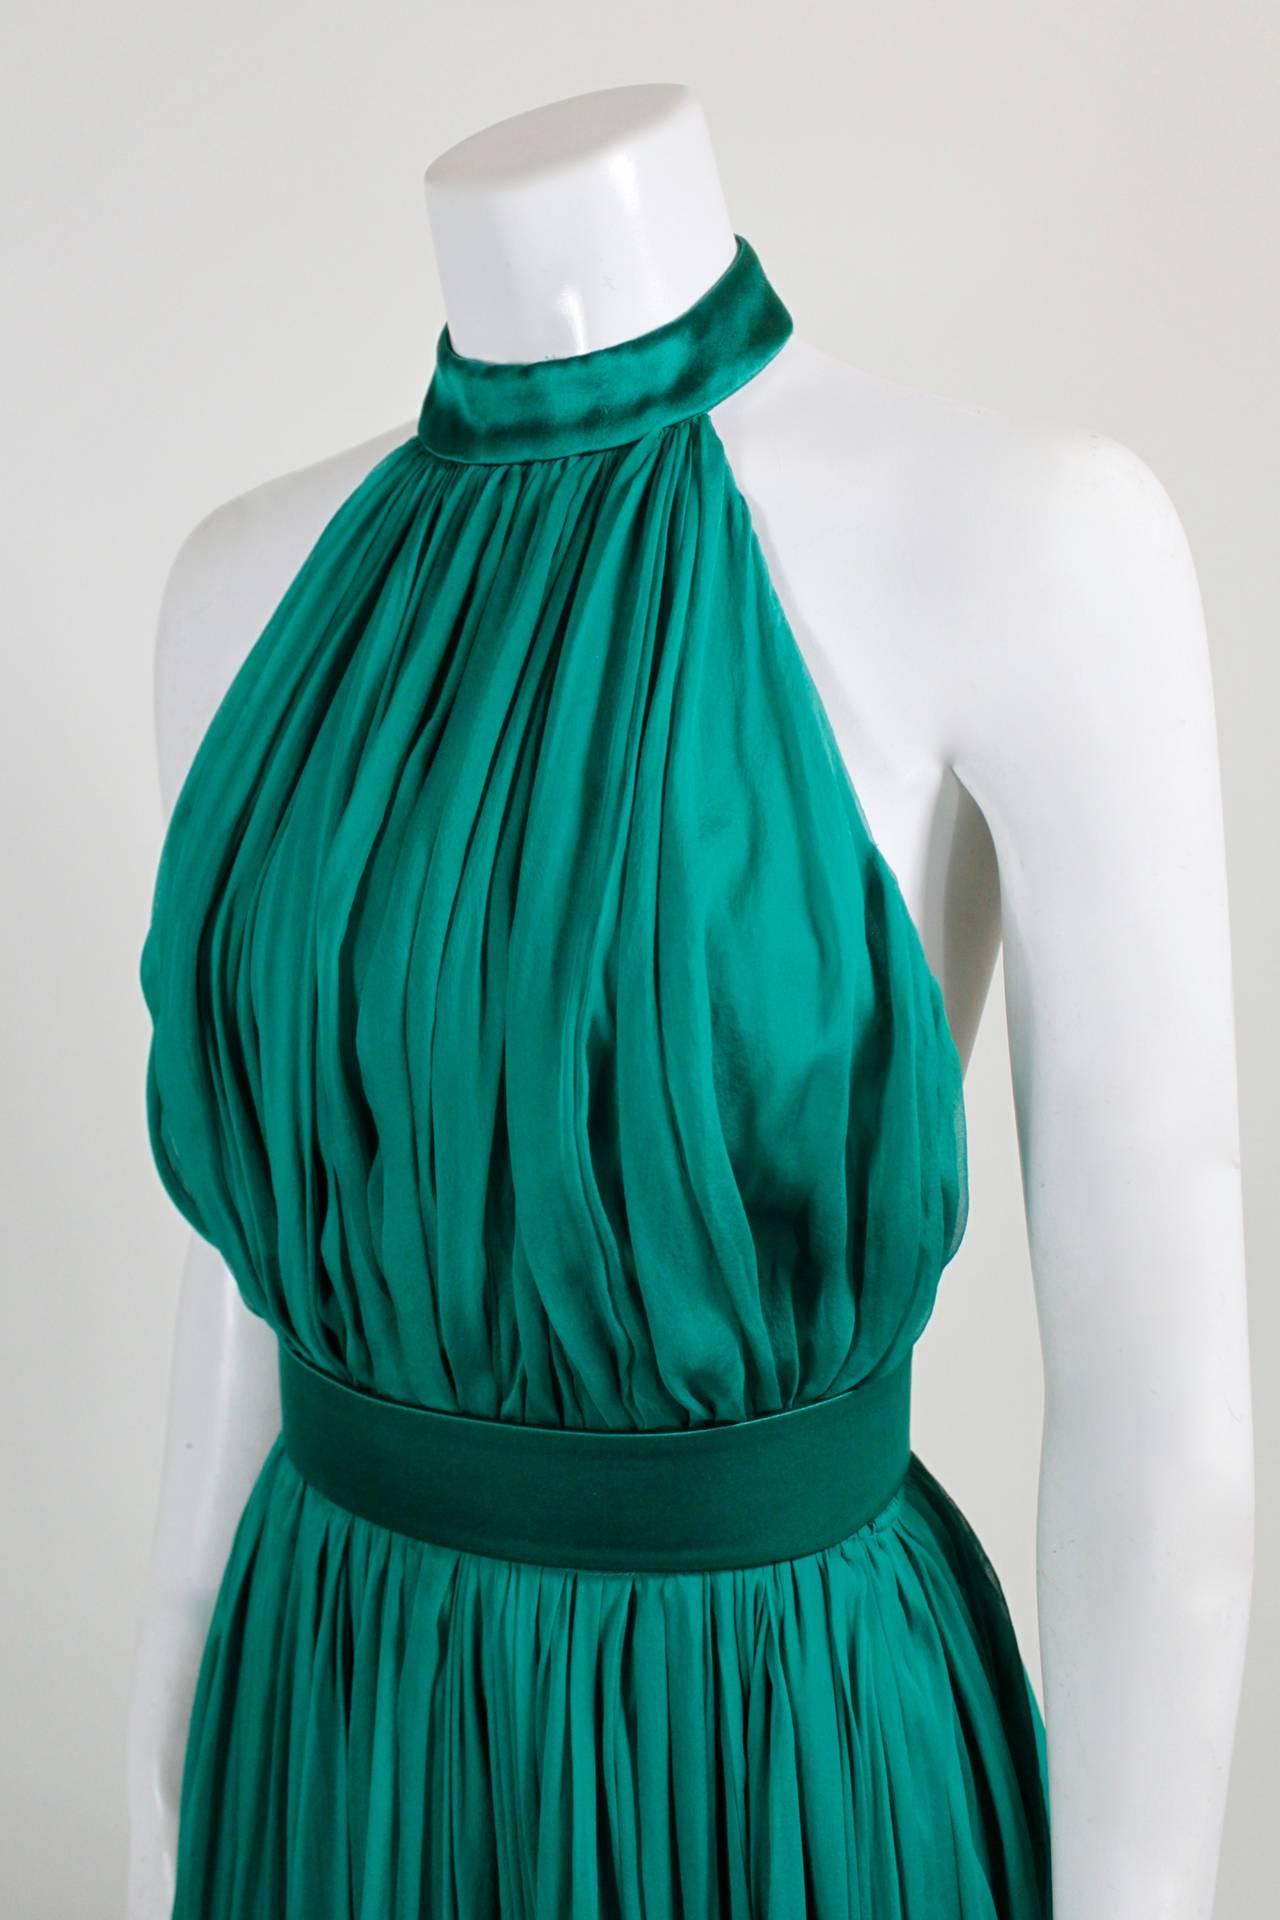 Alexander McQueen 2010 Flowing Emerald Green Chiffon Halter Gown with Belt 5